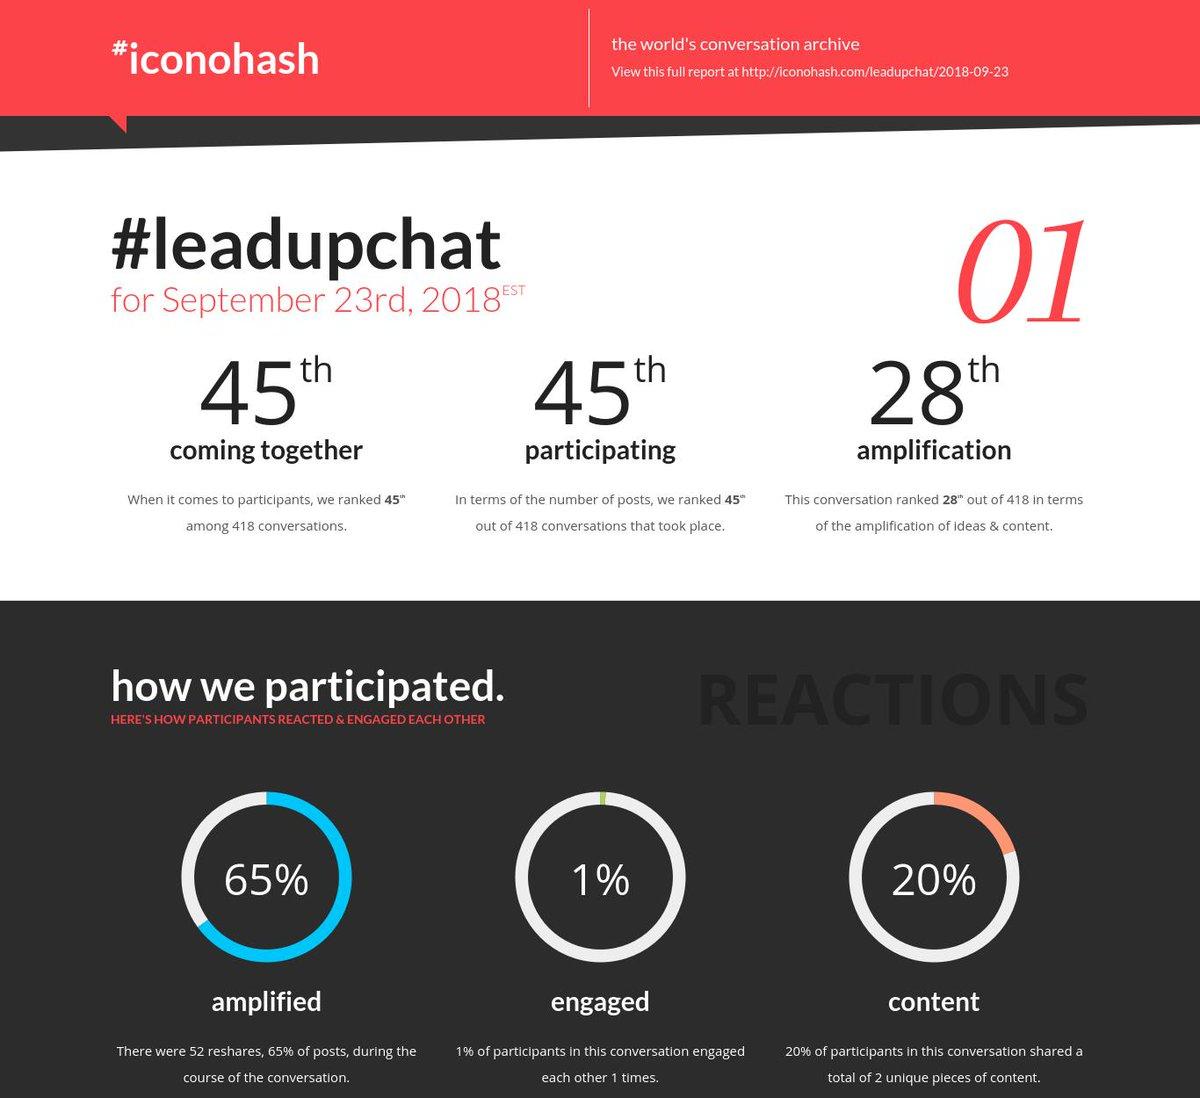 #Leadupchat Latest News Trends Updates Images - iconohash